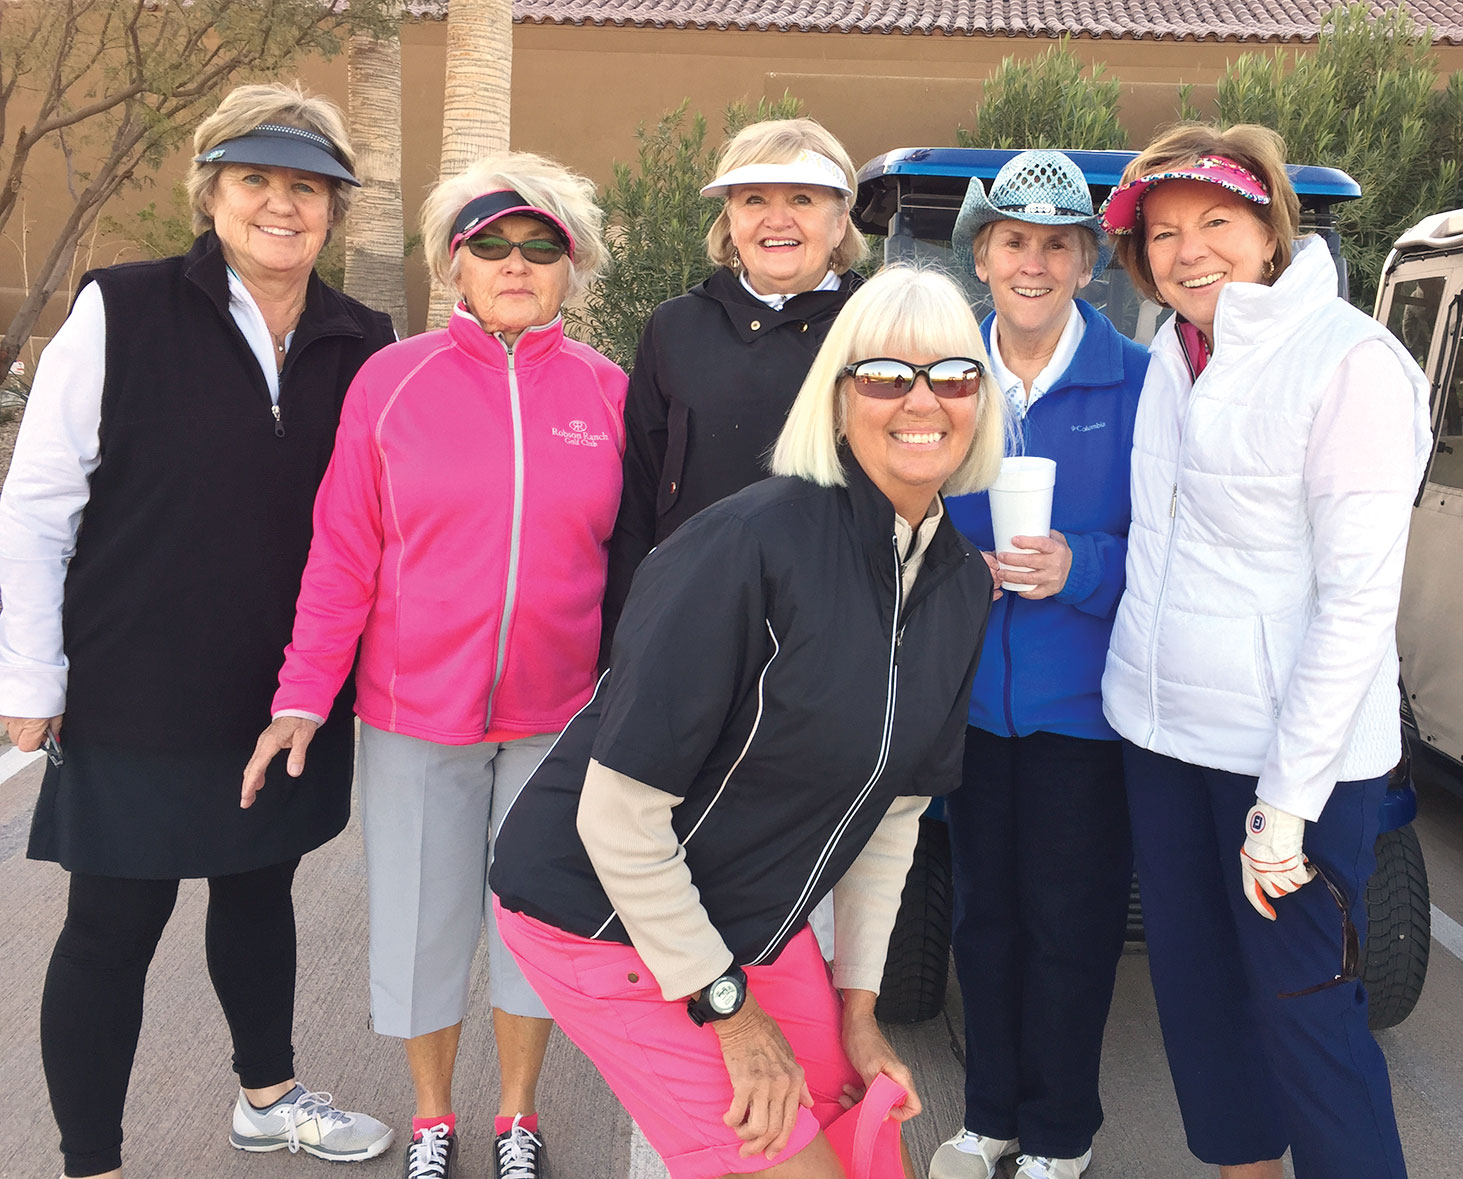 Members and guests: Marylou Walton, Patti Baumann, Jeri Srenaski, Sandy Horzauk, Joanne Heiman; in front Patty Bruchez